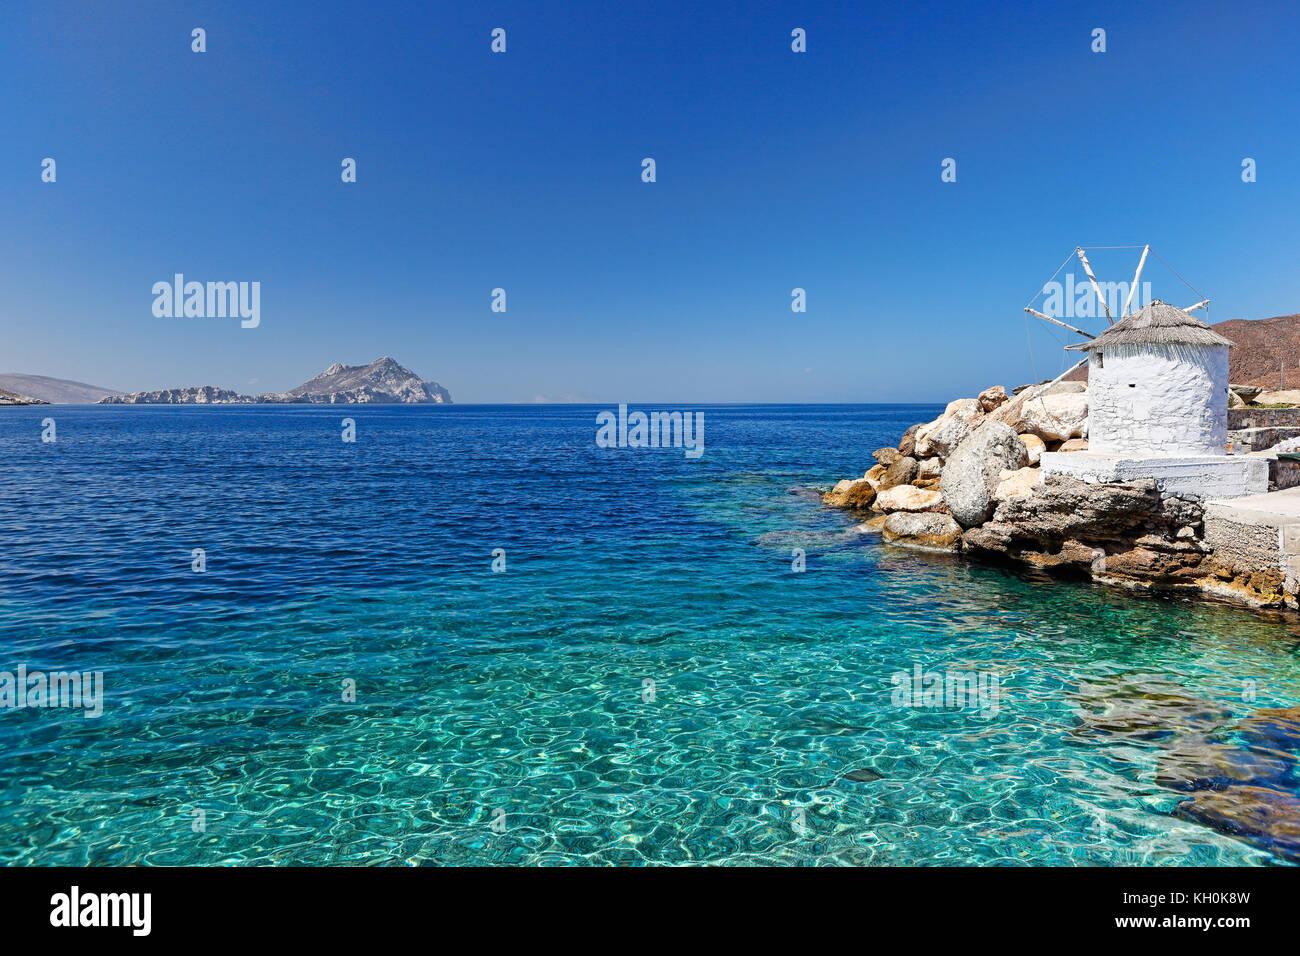 The port of Aegiali in Amorgos island, Greece - Stock Image